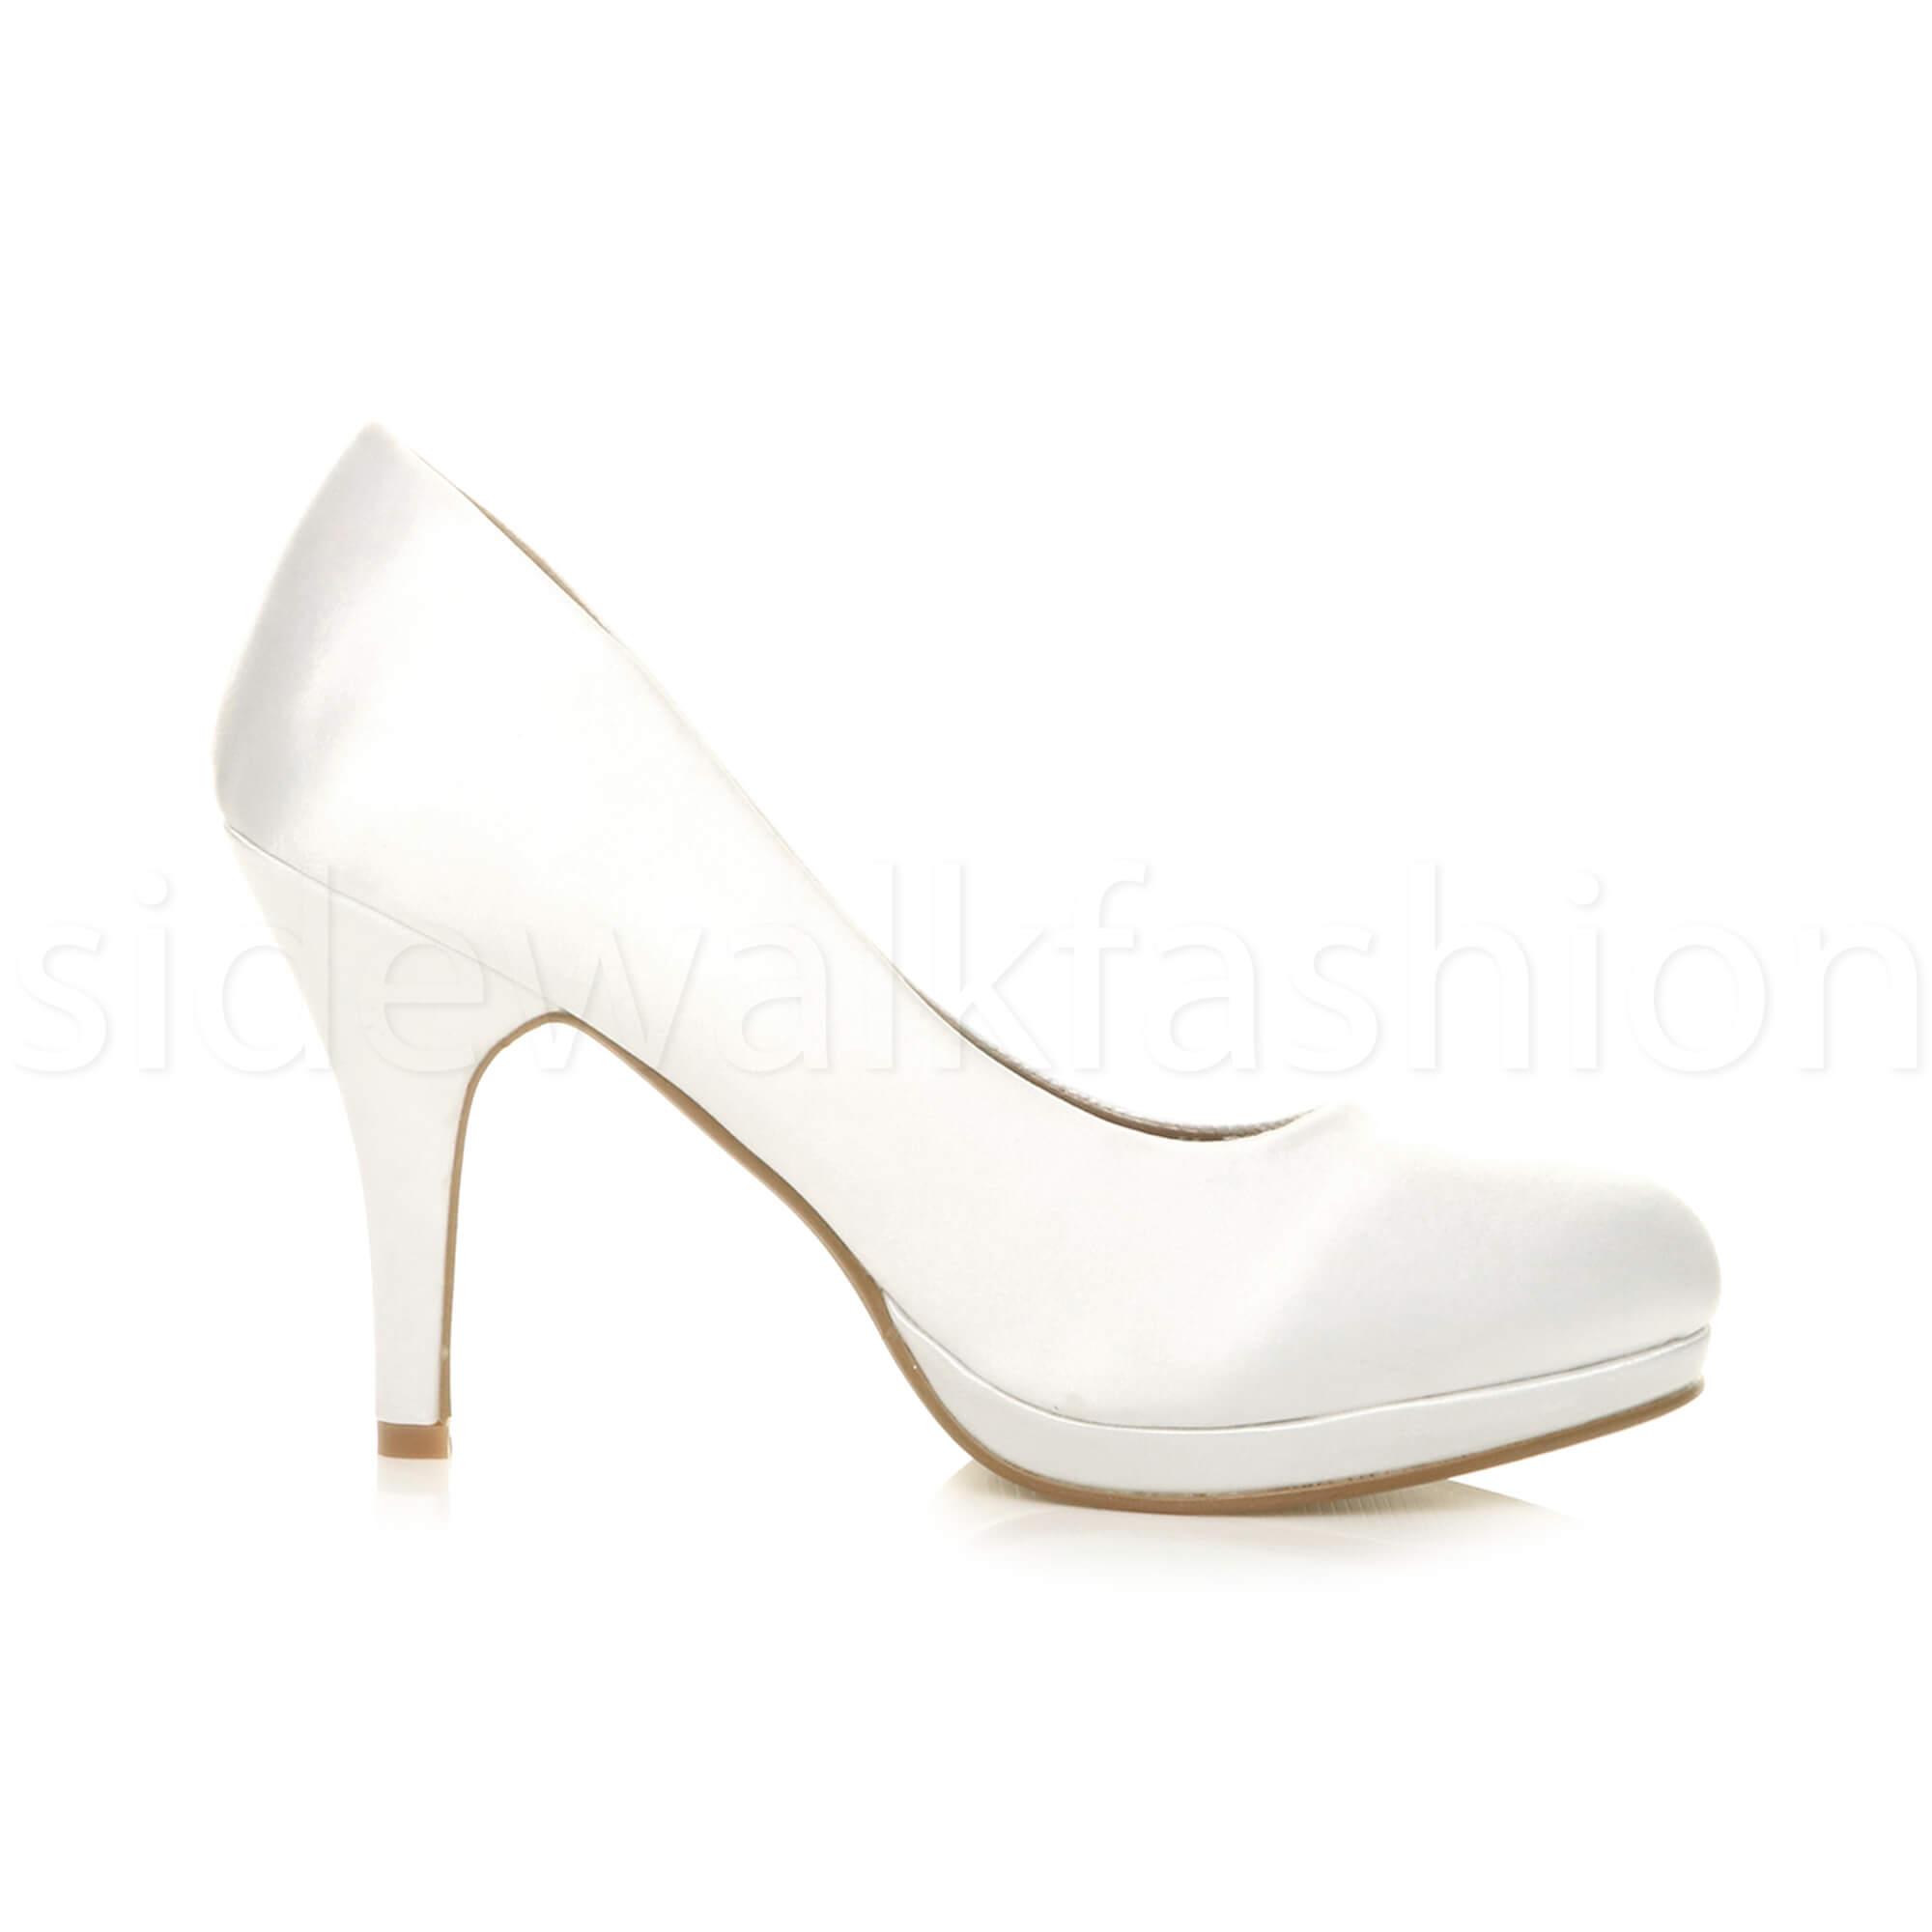 Womens-ladies-high-mid-heel-platform-wedding-evening-bridesmaid-court-shoes-size thumbnail 200